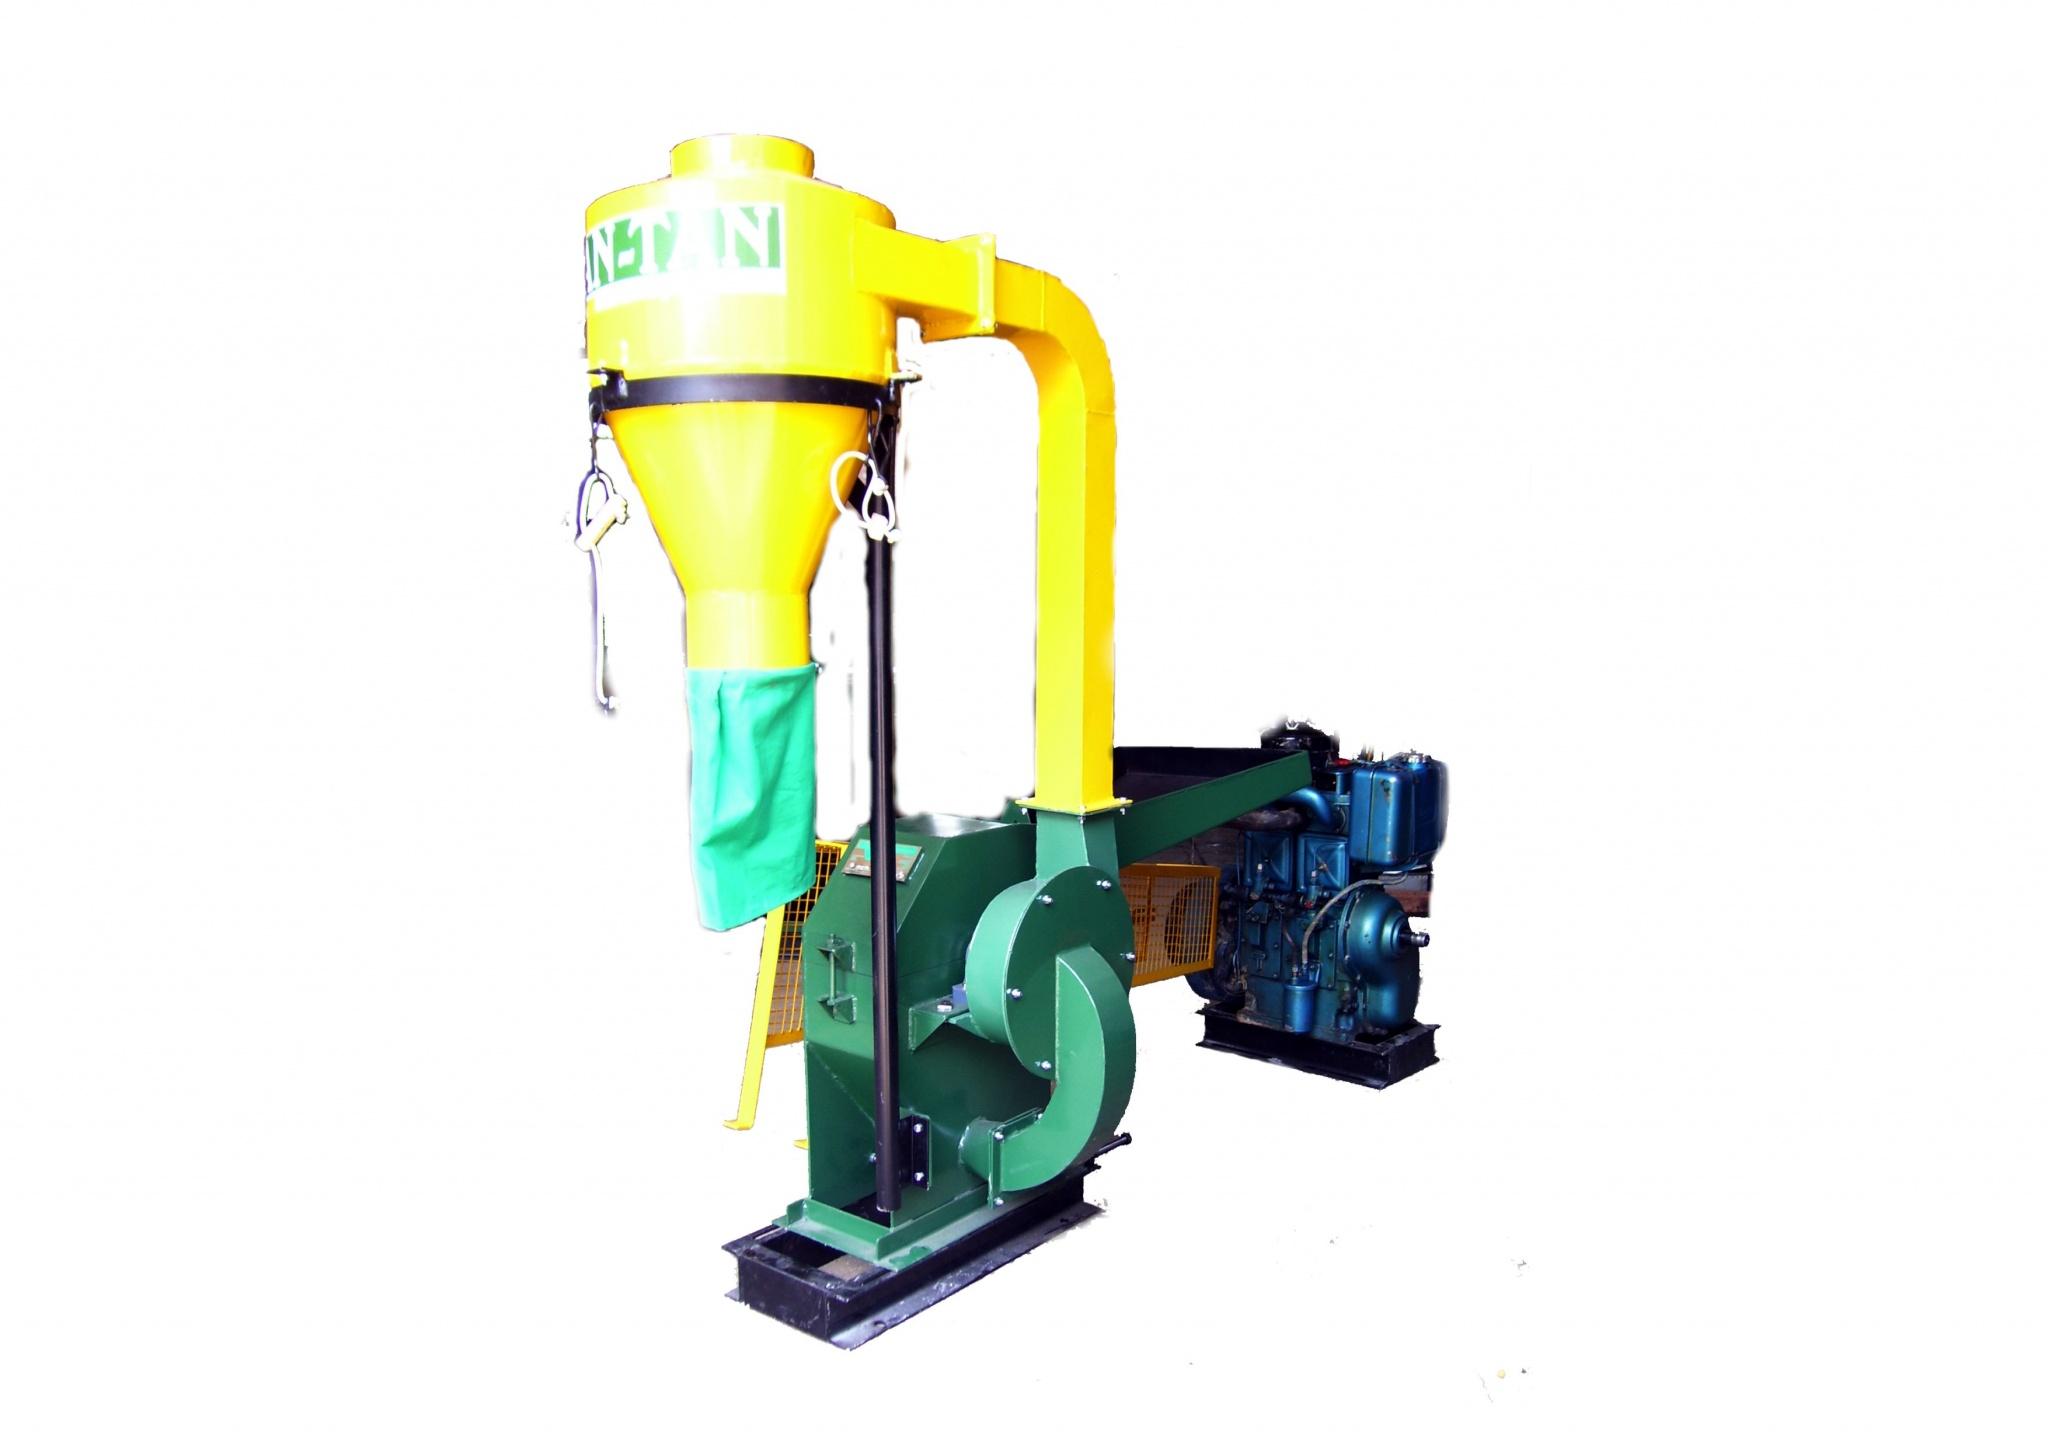 https://www.tanroy.com/products/maize_sheller/PKBbX6BqLpkq433838